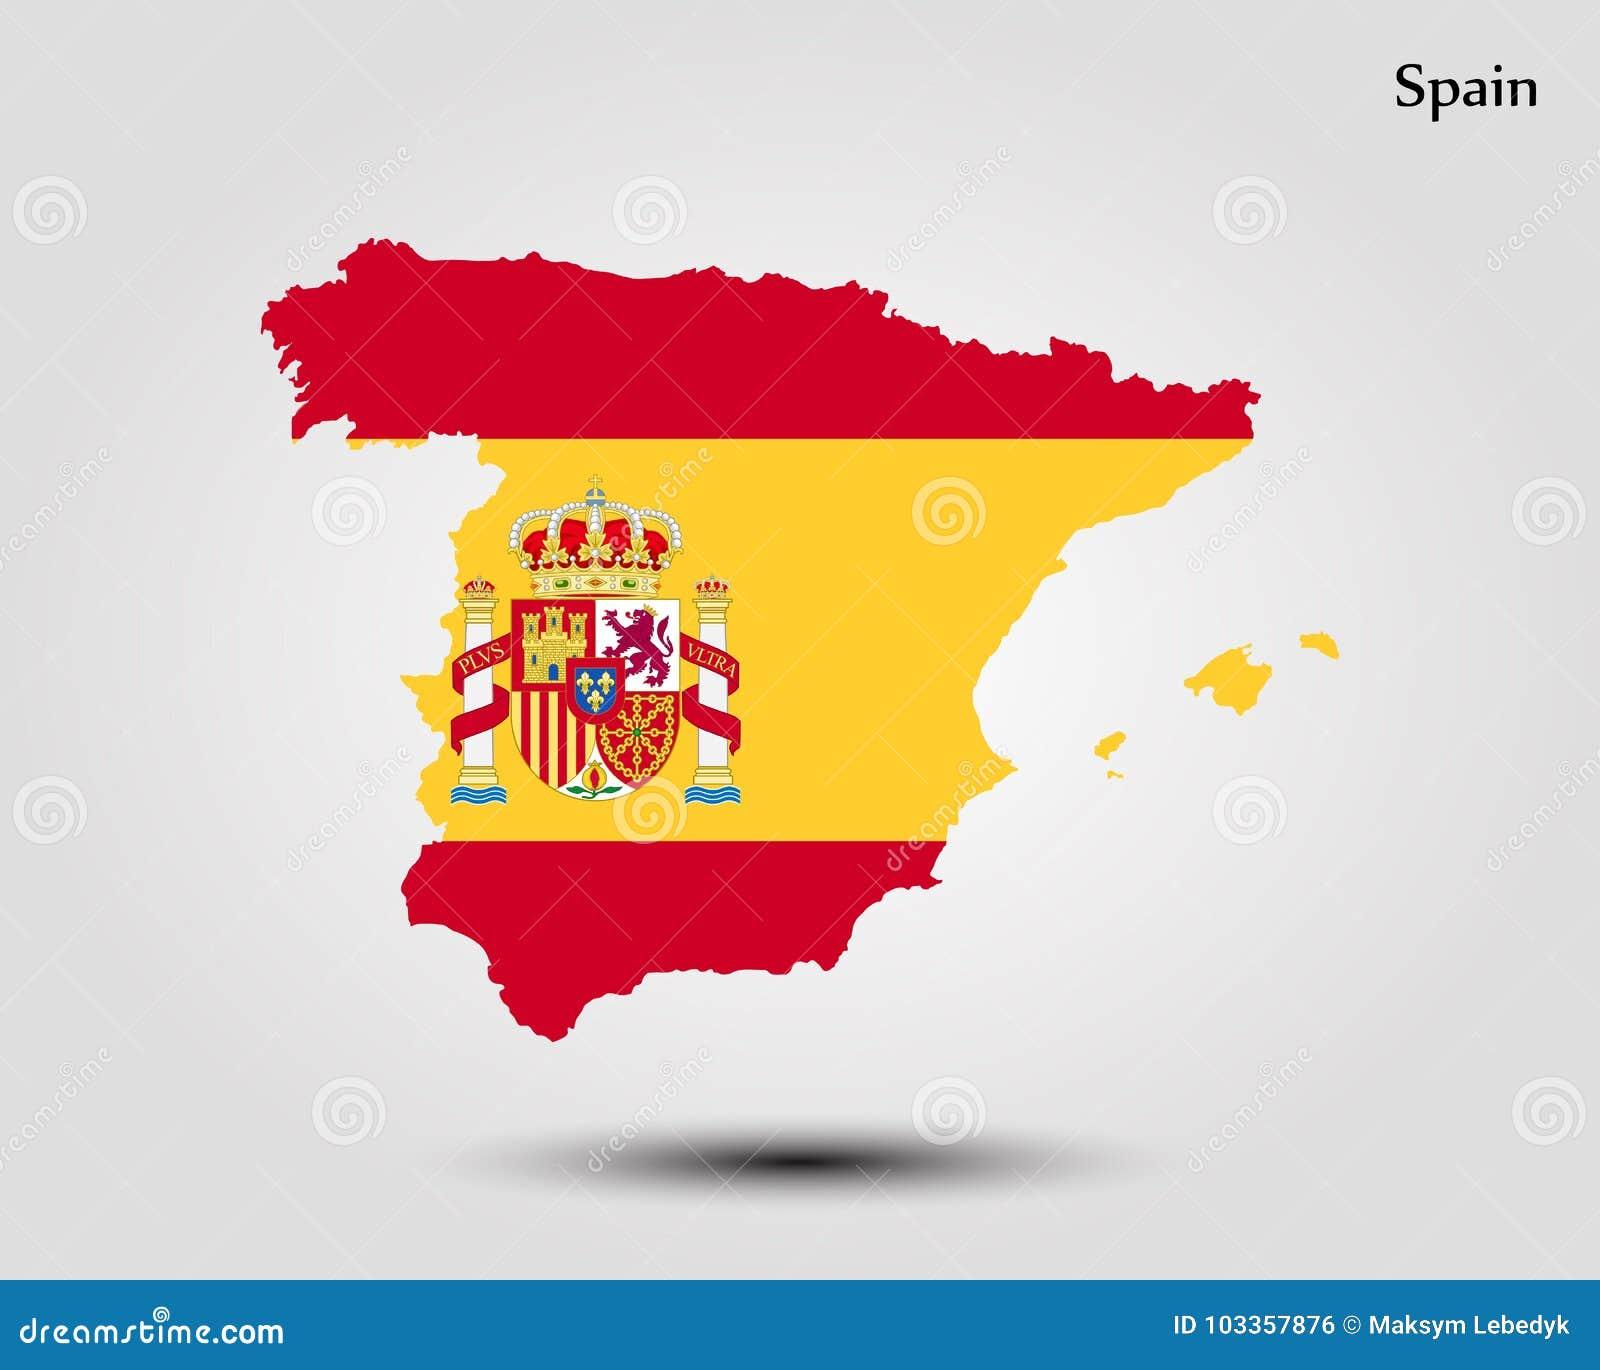 Map of Spain stock illustration. Illustration of earth - 103357876